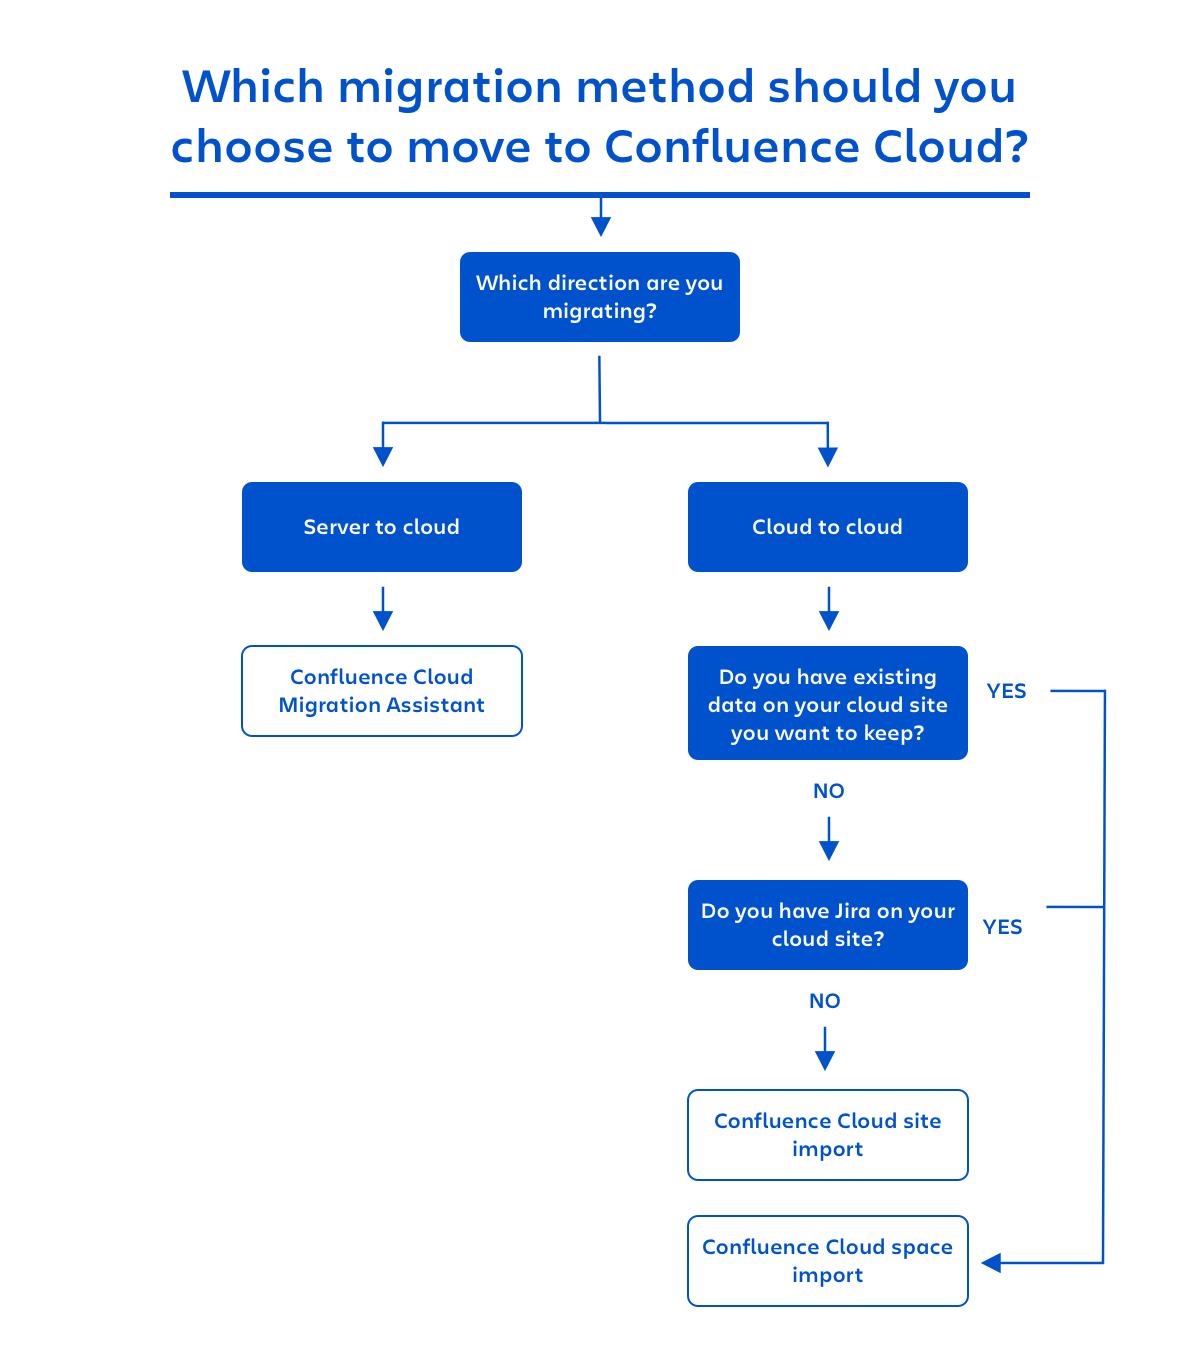 Confluence Cloud に移行するためのそれぞれの移行方法の使用タイミングを示すフロー ダイアグラム。